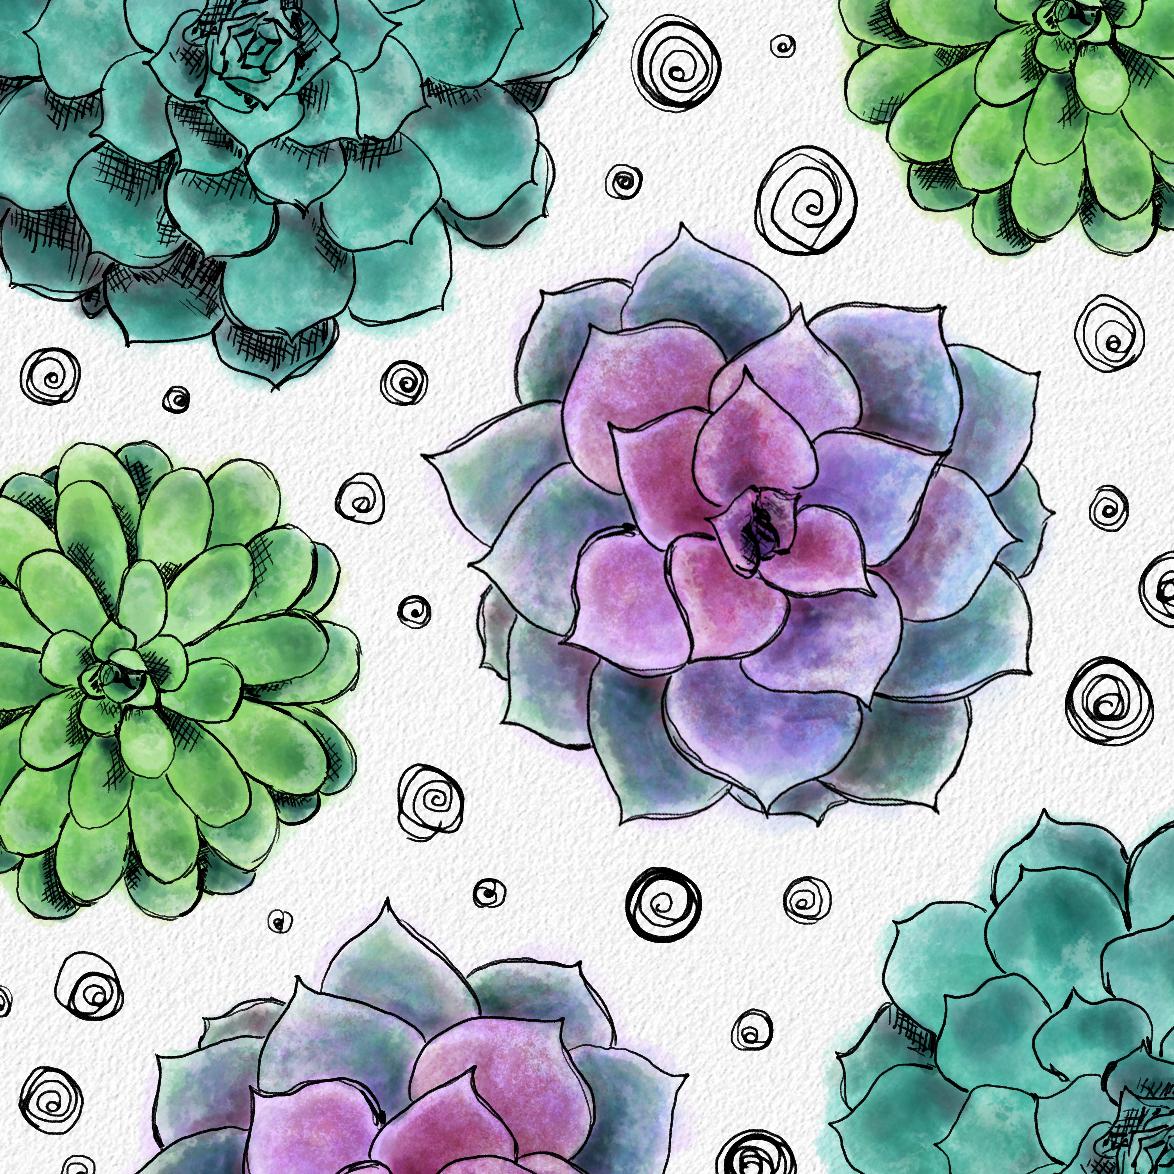 floral whythesucculentnot.jpg